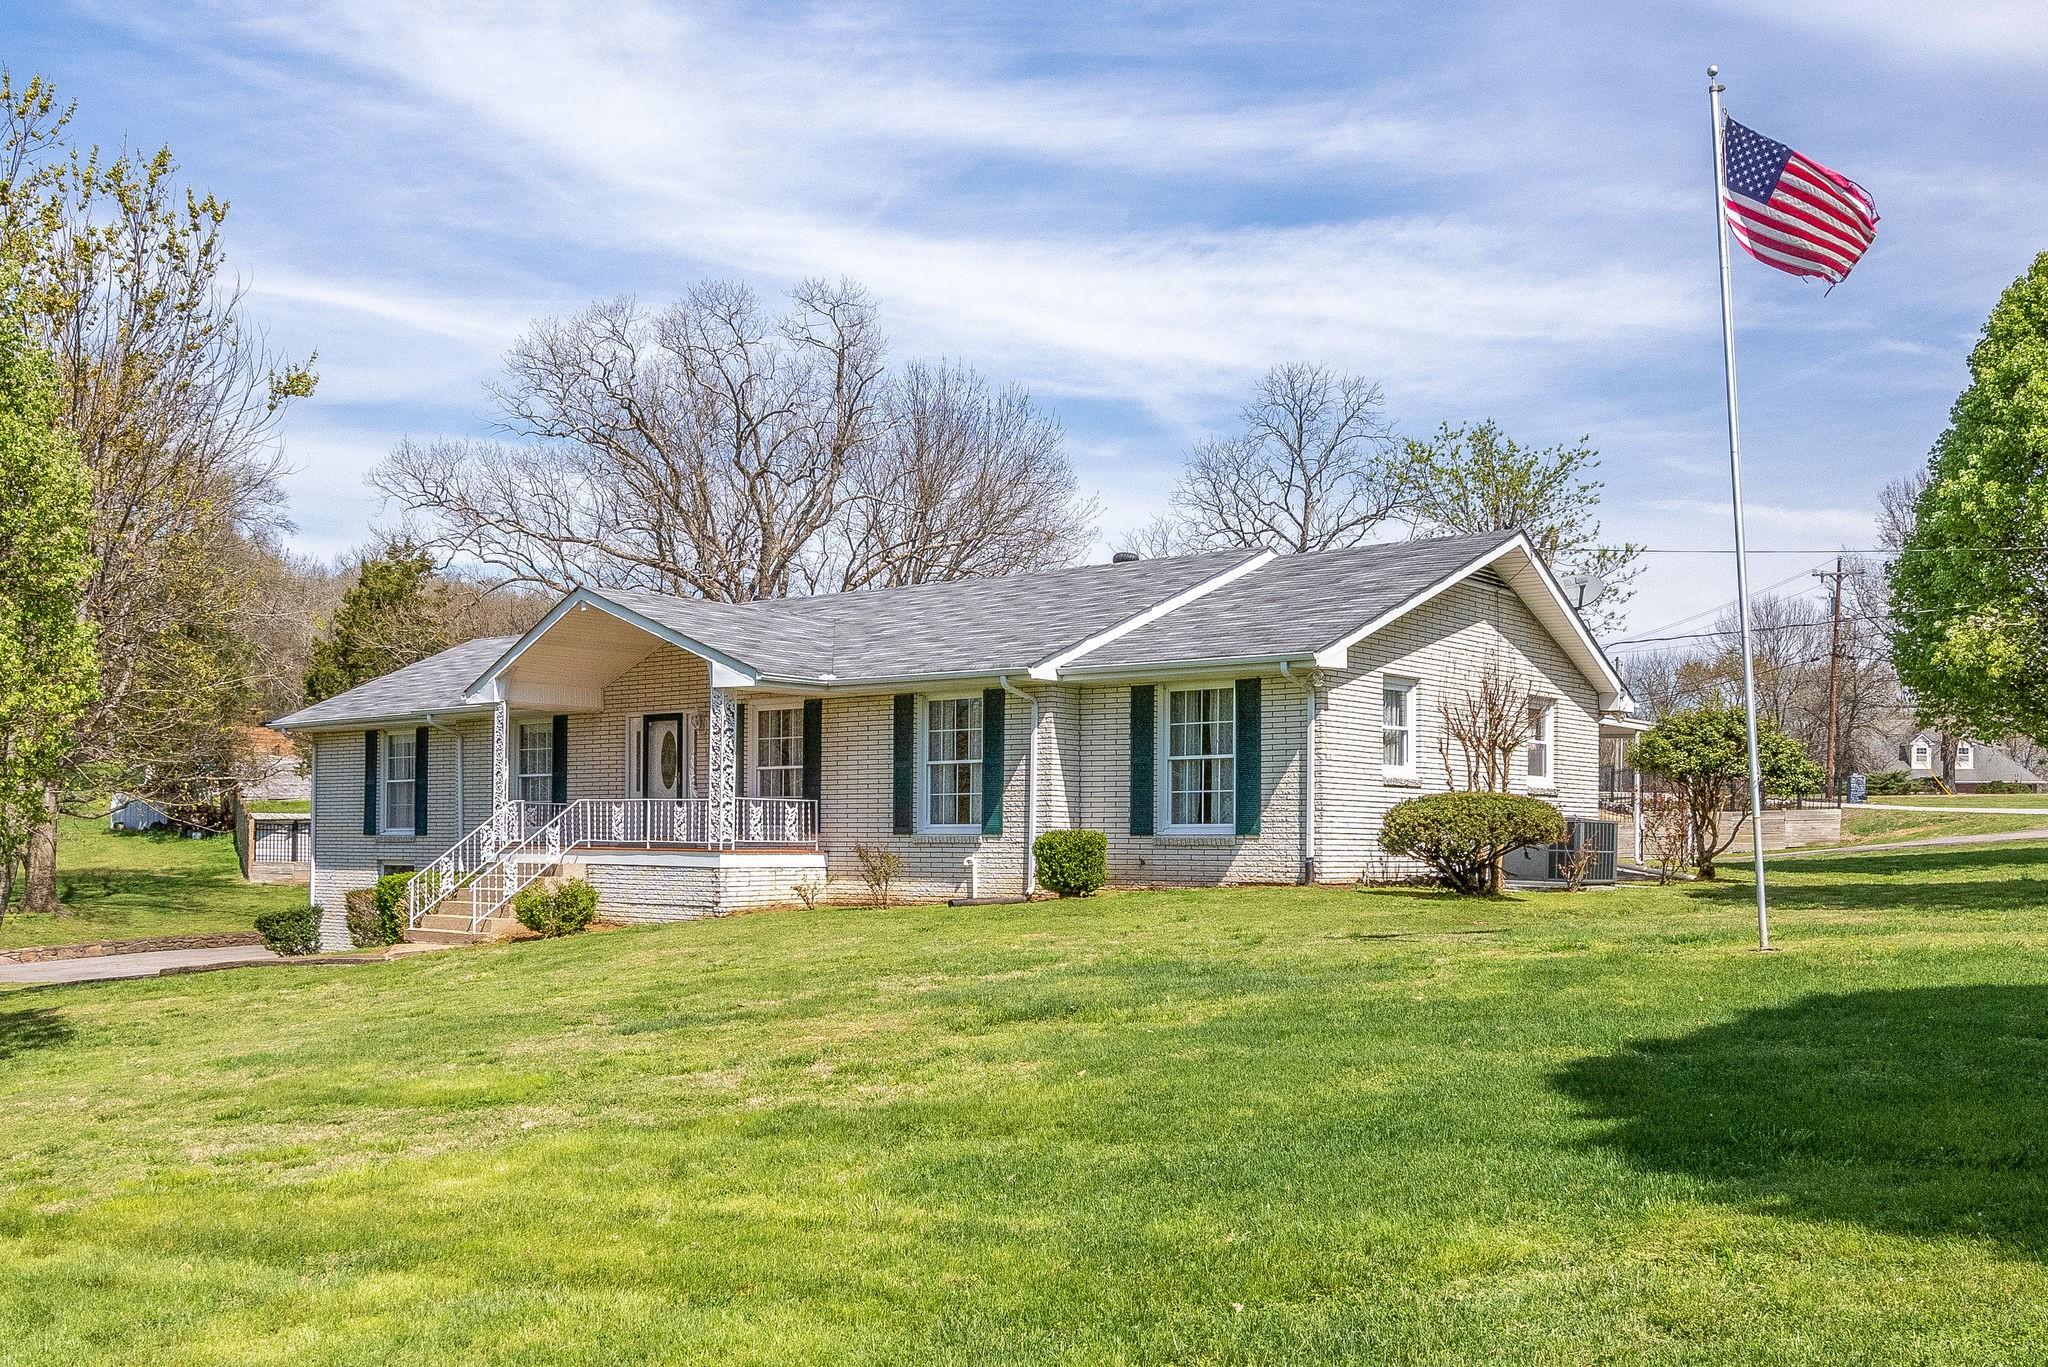 231 Northside Dr, Madison, TN 37115 - Madison, TN real estate listing